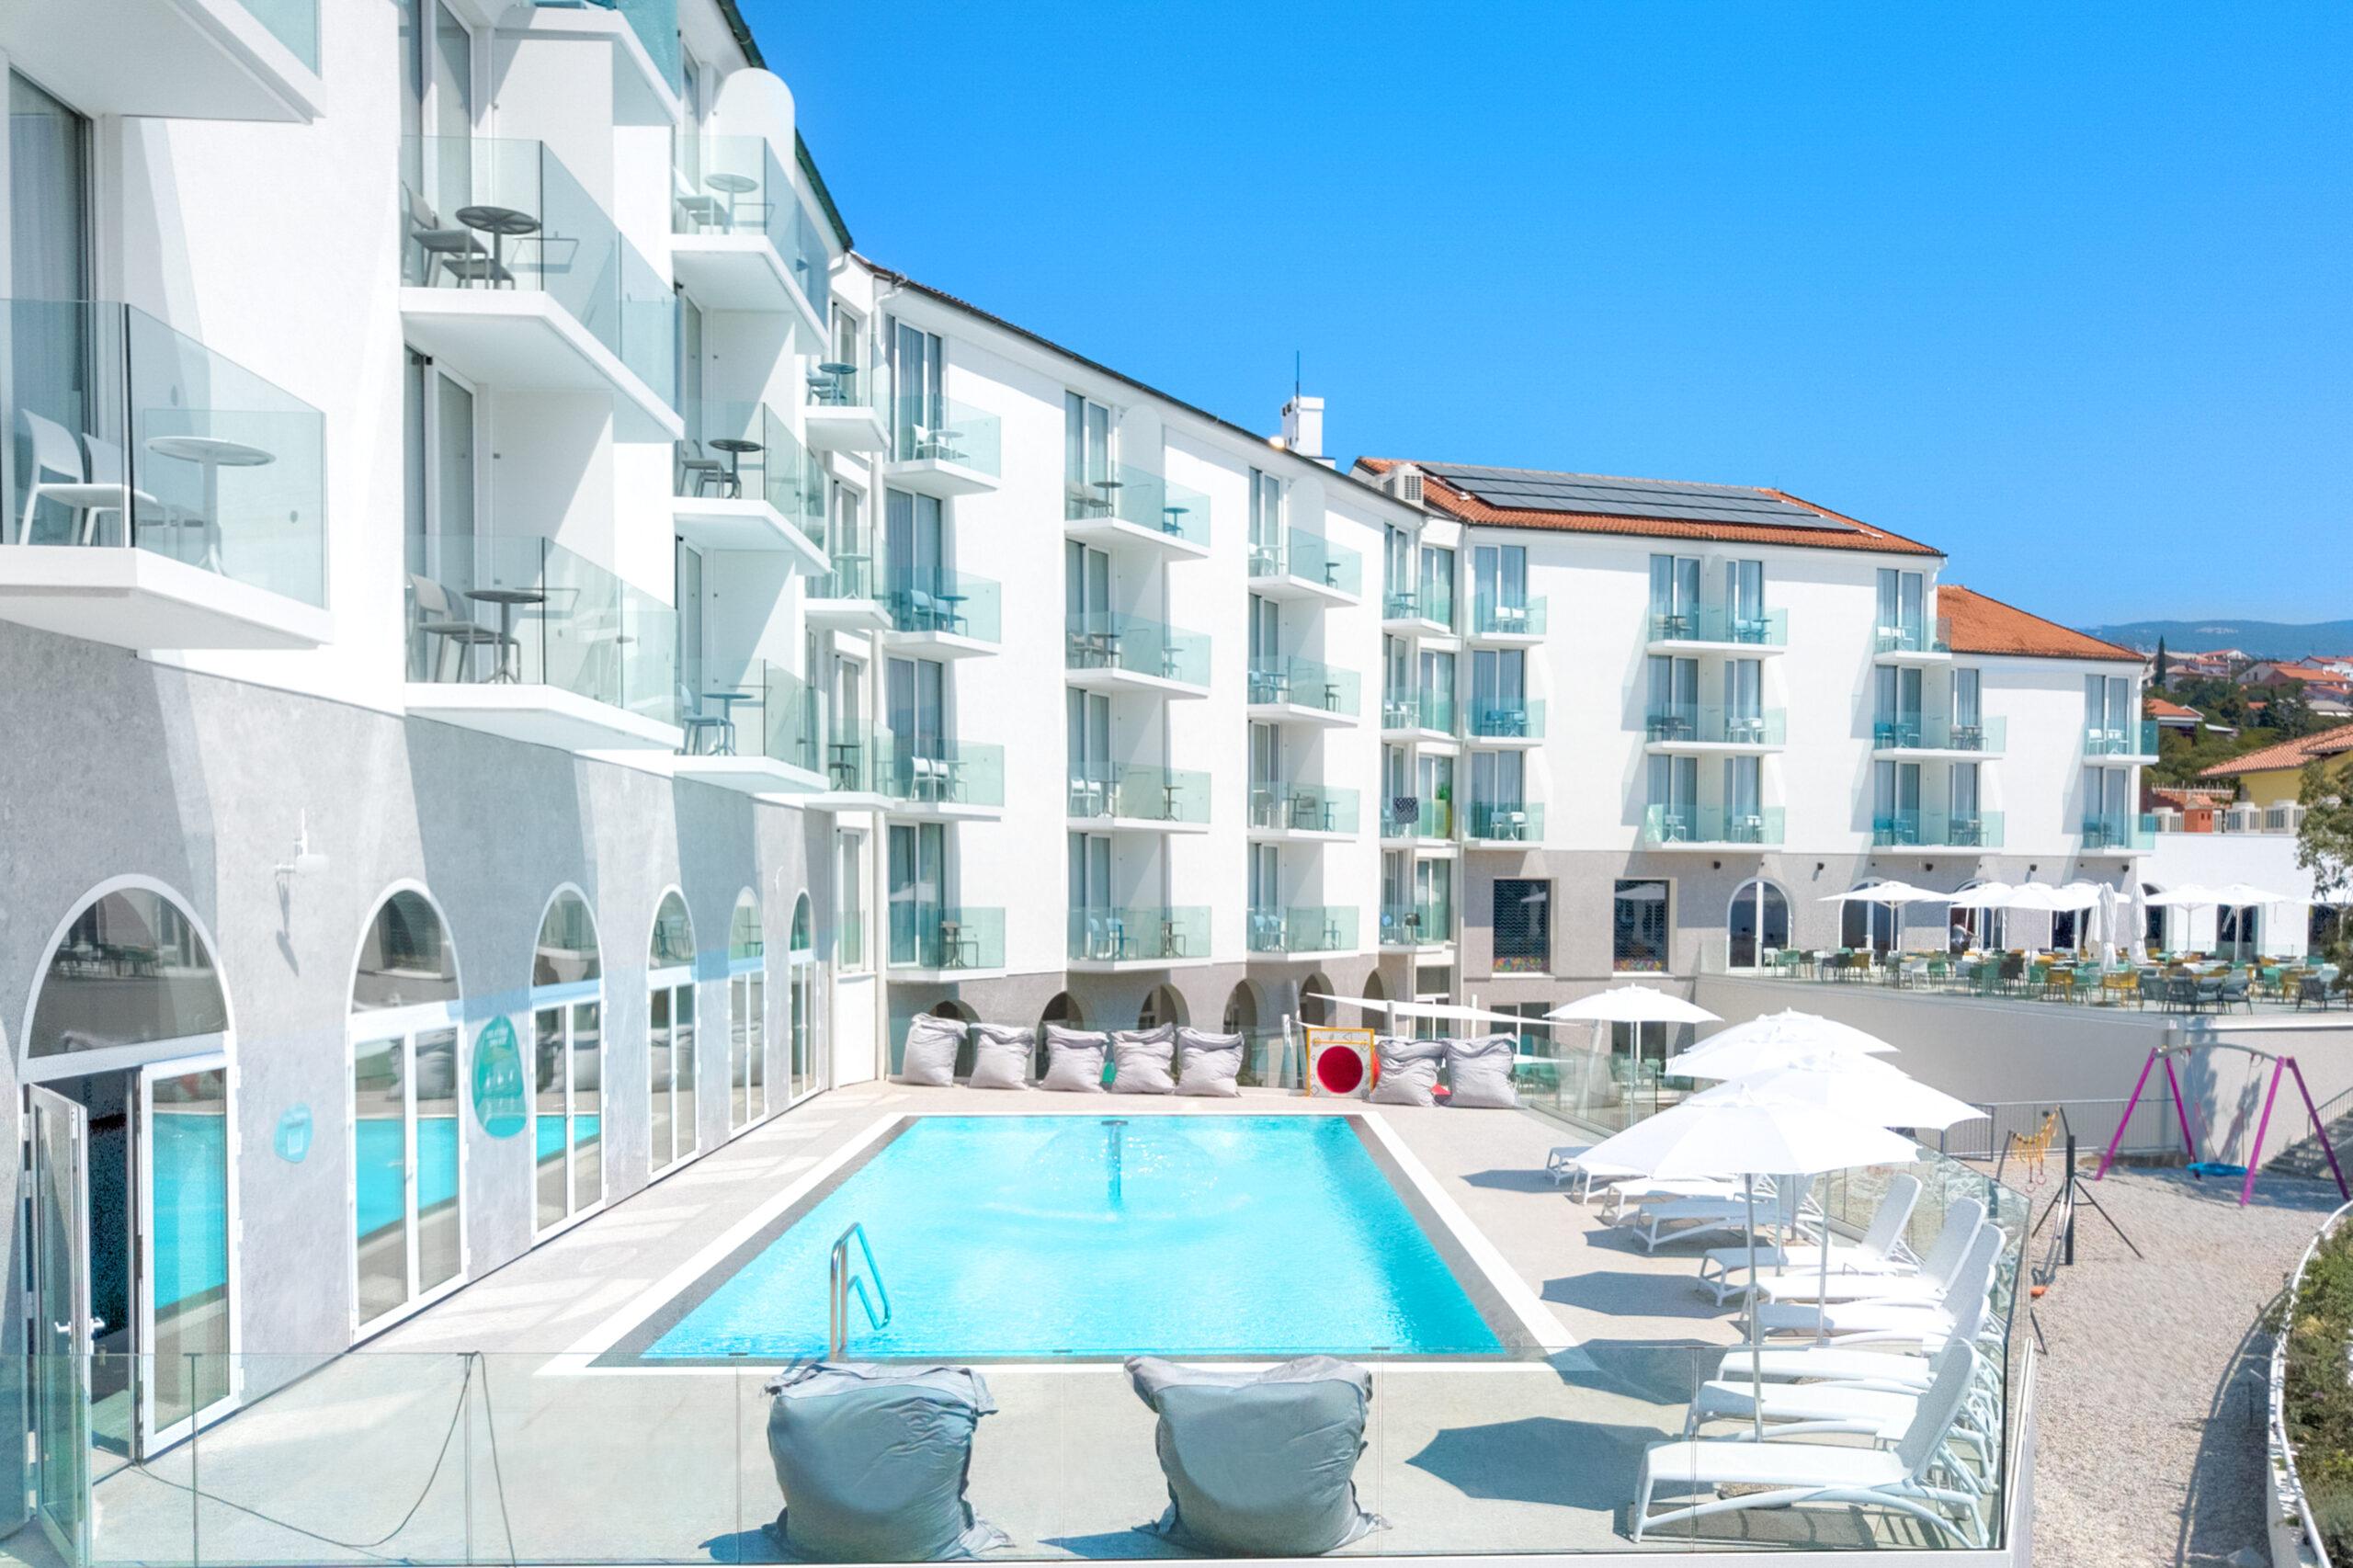 Exterior outdoor pool_hotel Lisanj (2)